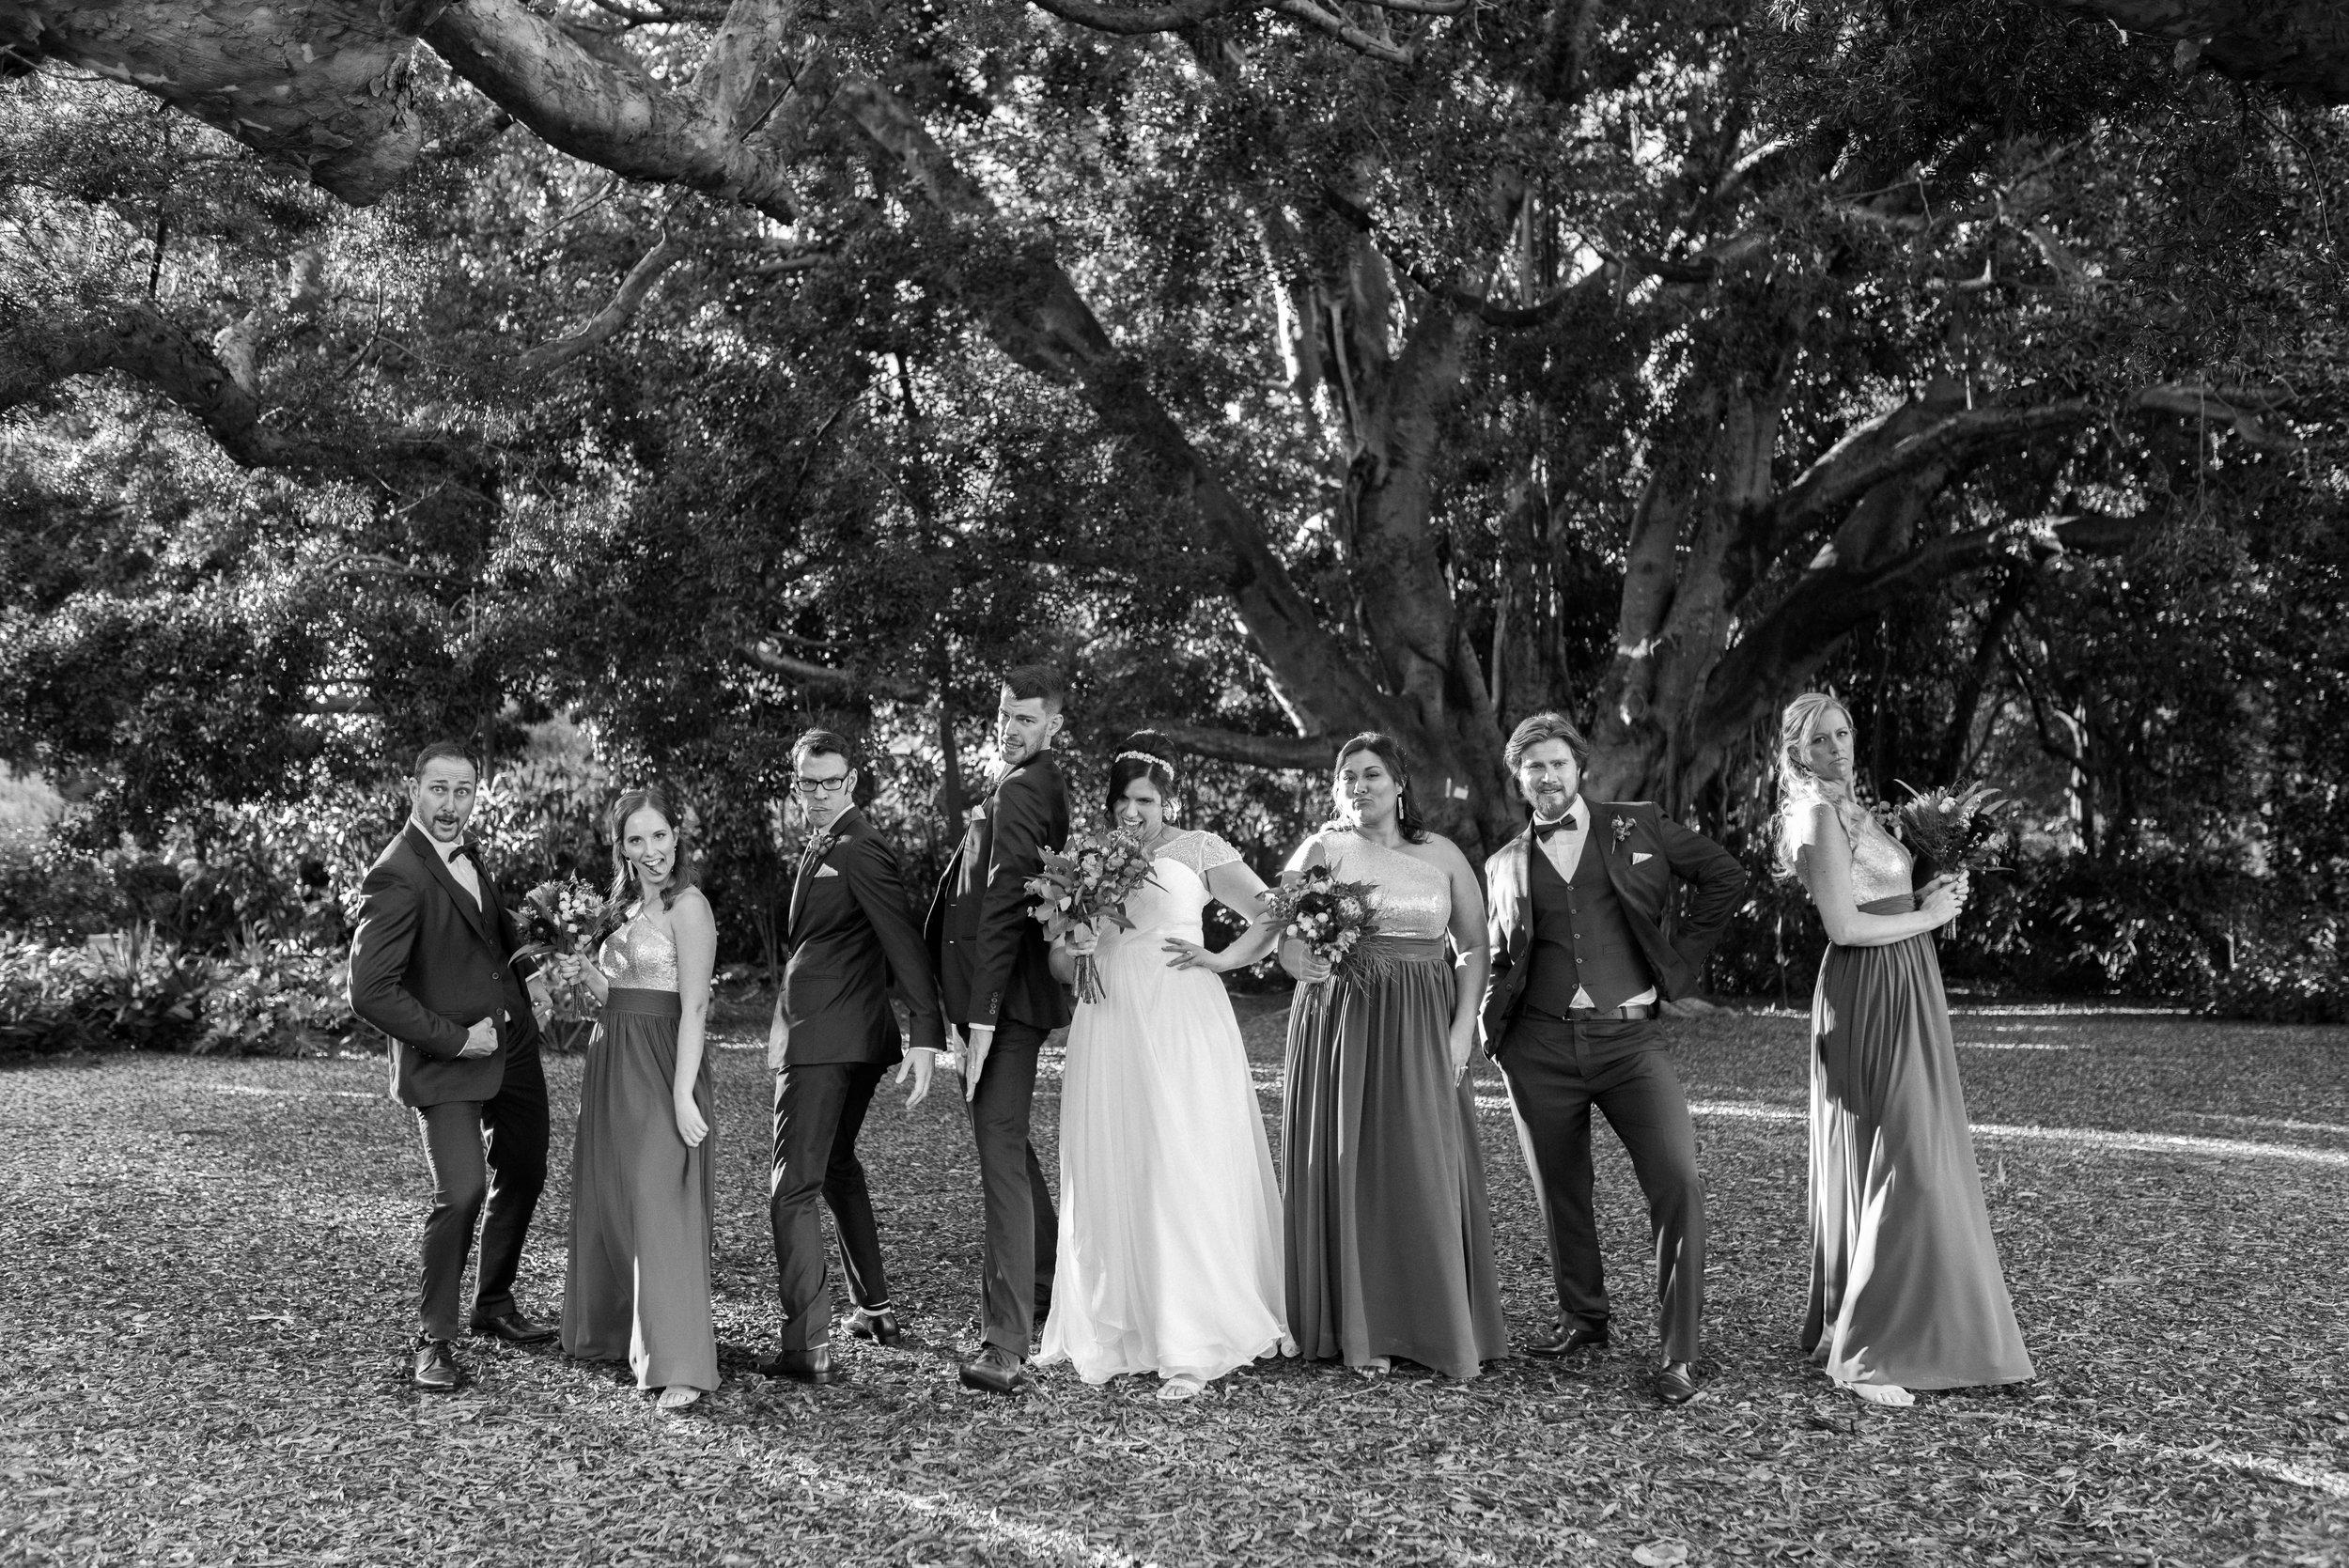 brisbane-city-wedding-photography-film-light-loft-westend-1-14.jpg